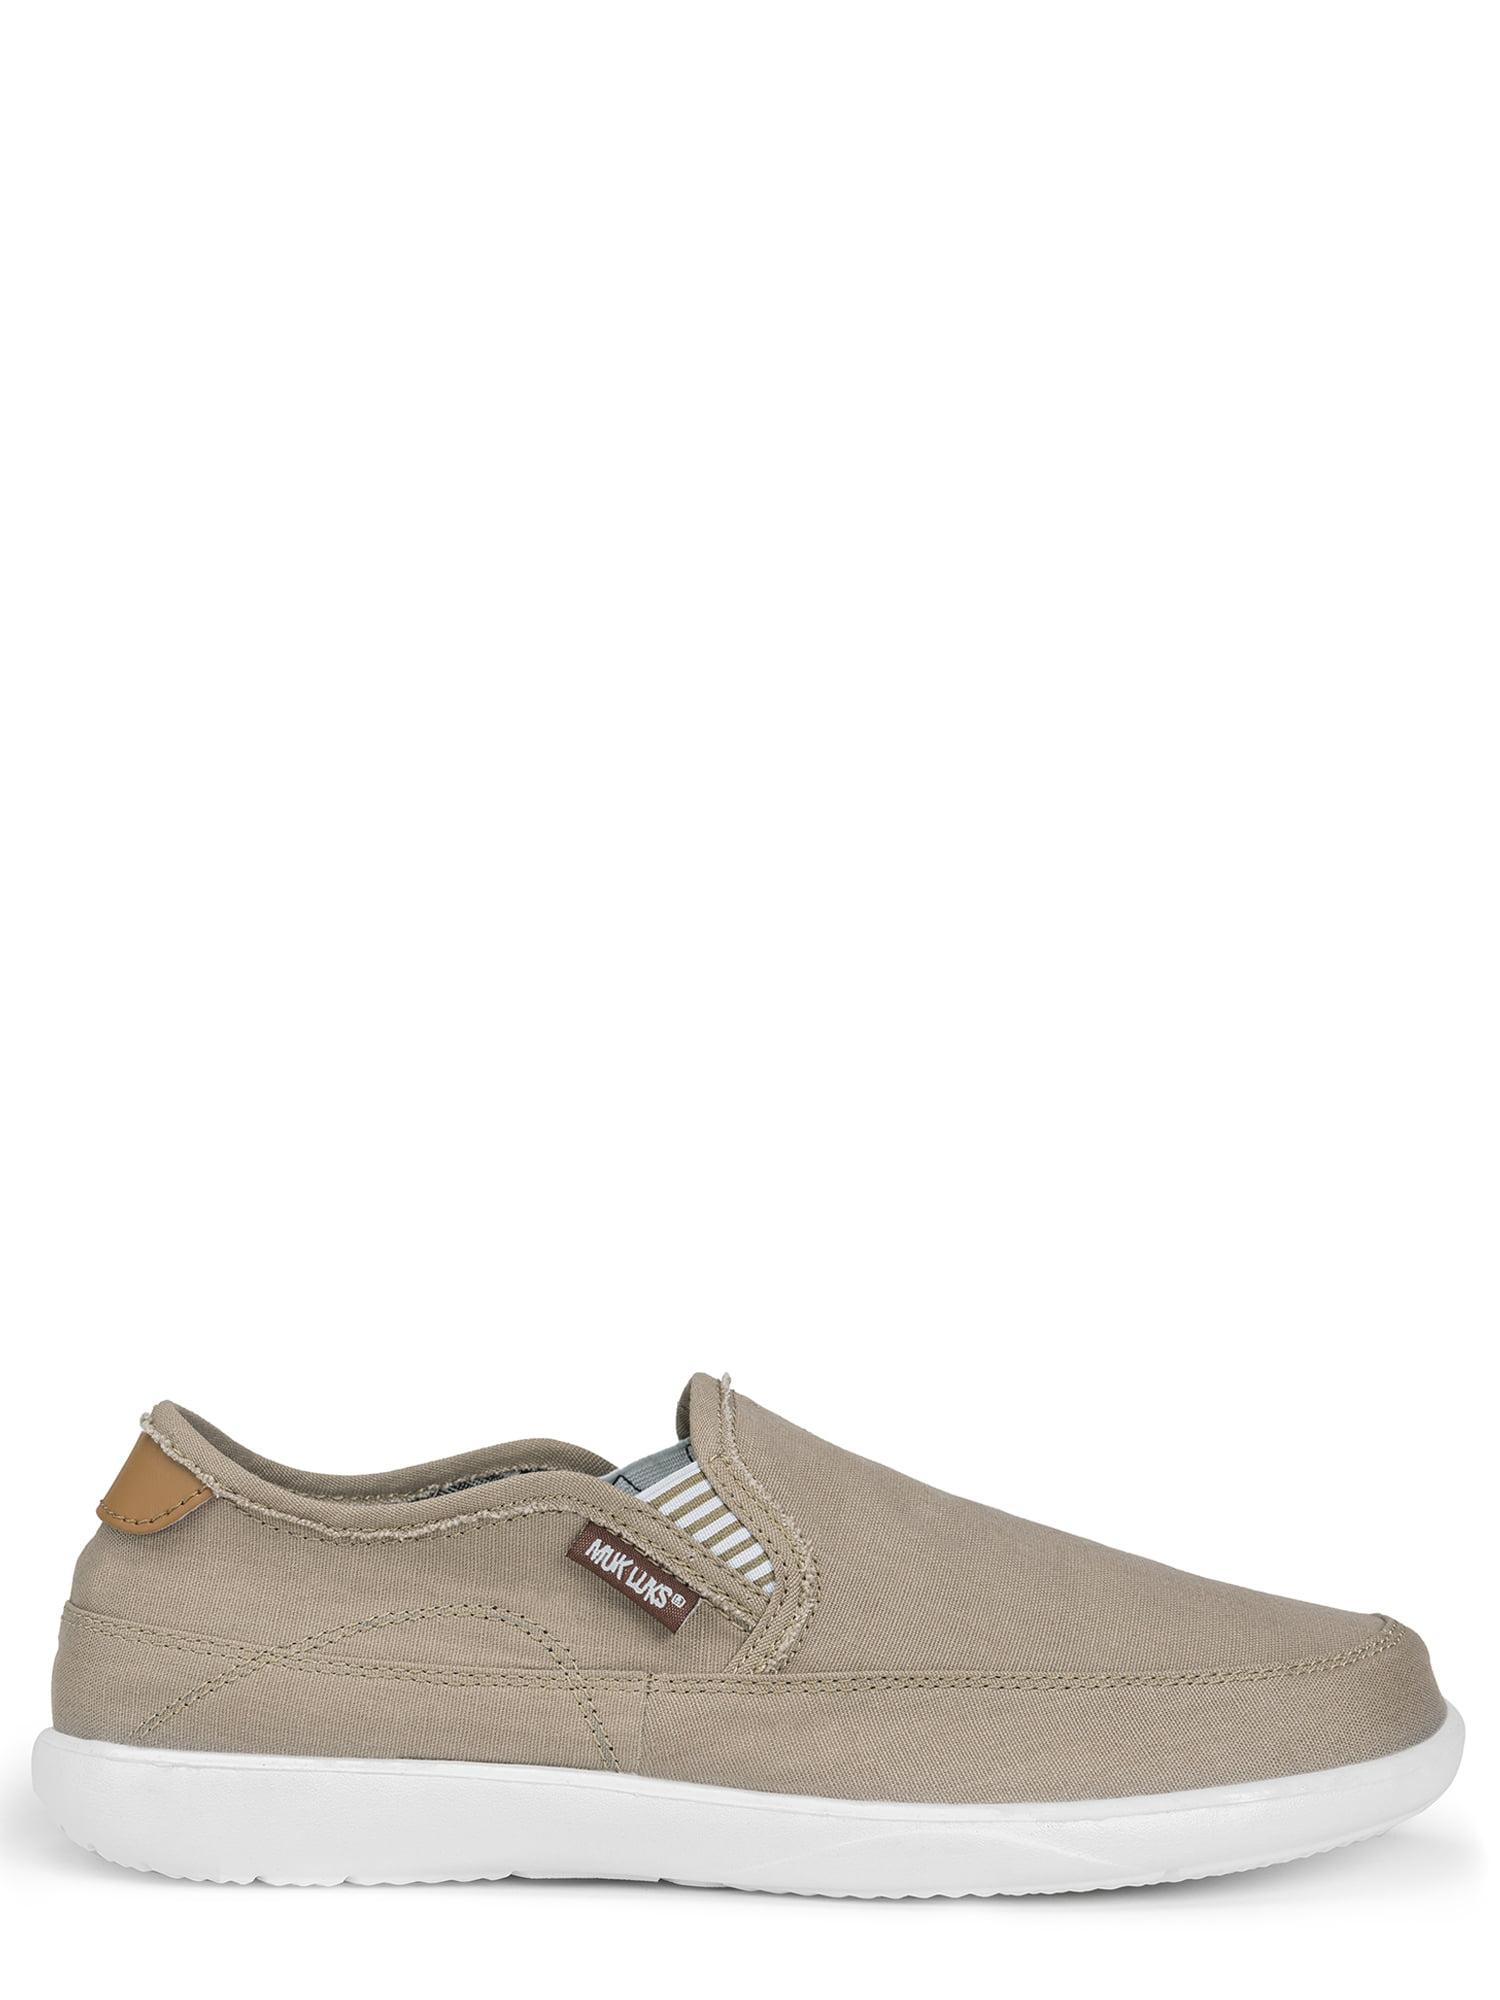 MUK LUKS® Men's Otto Canvas Slip-on Boat Shoes